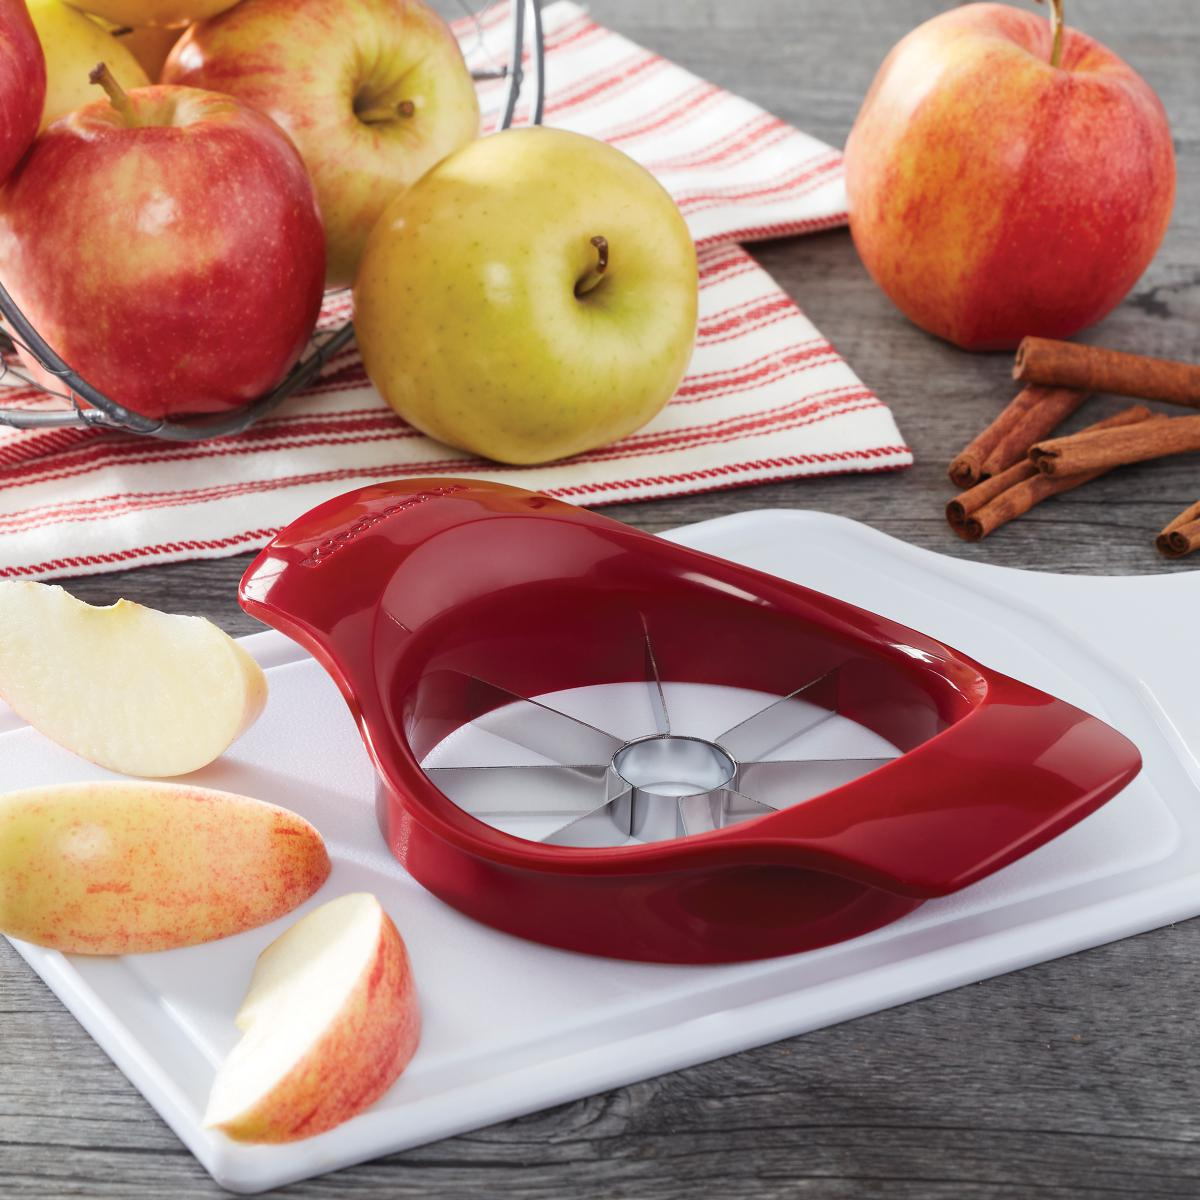 Cortador e Fatiador de Frutas e Legumes Aço Inox KitchenAid